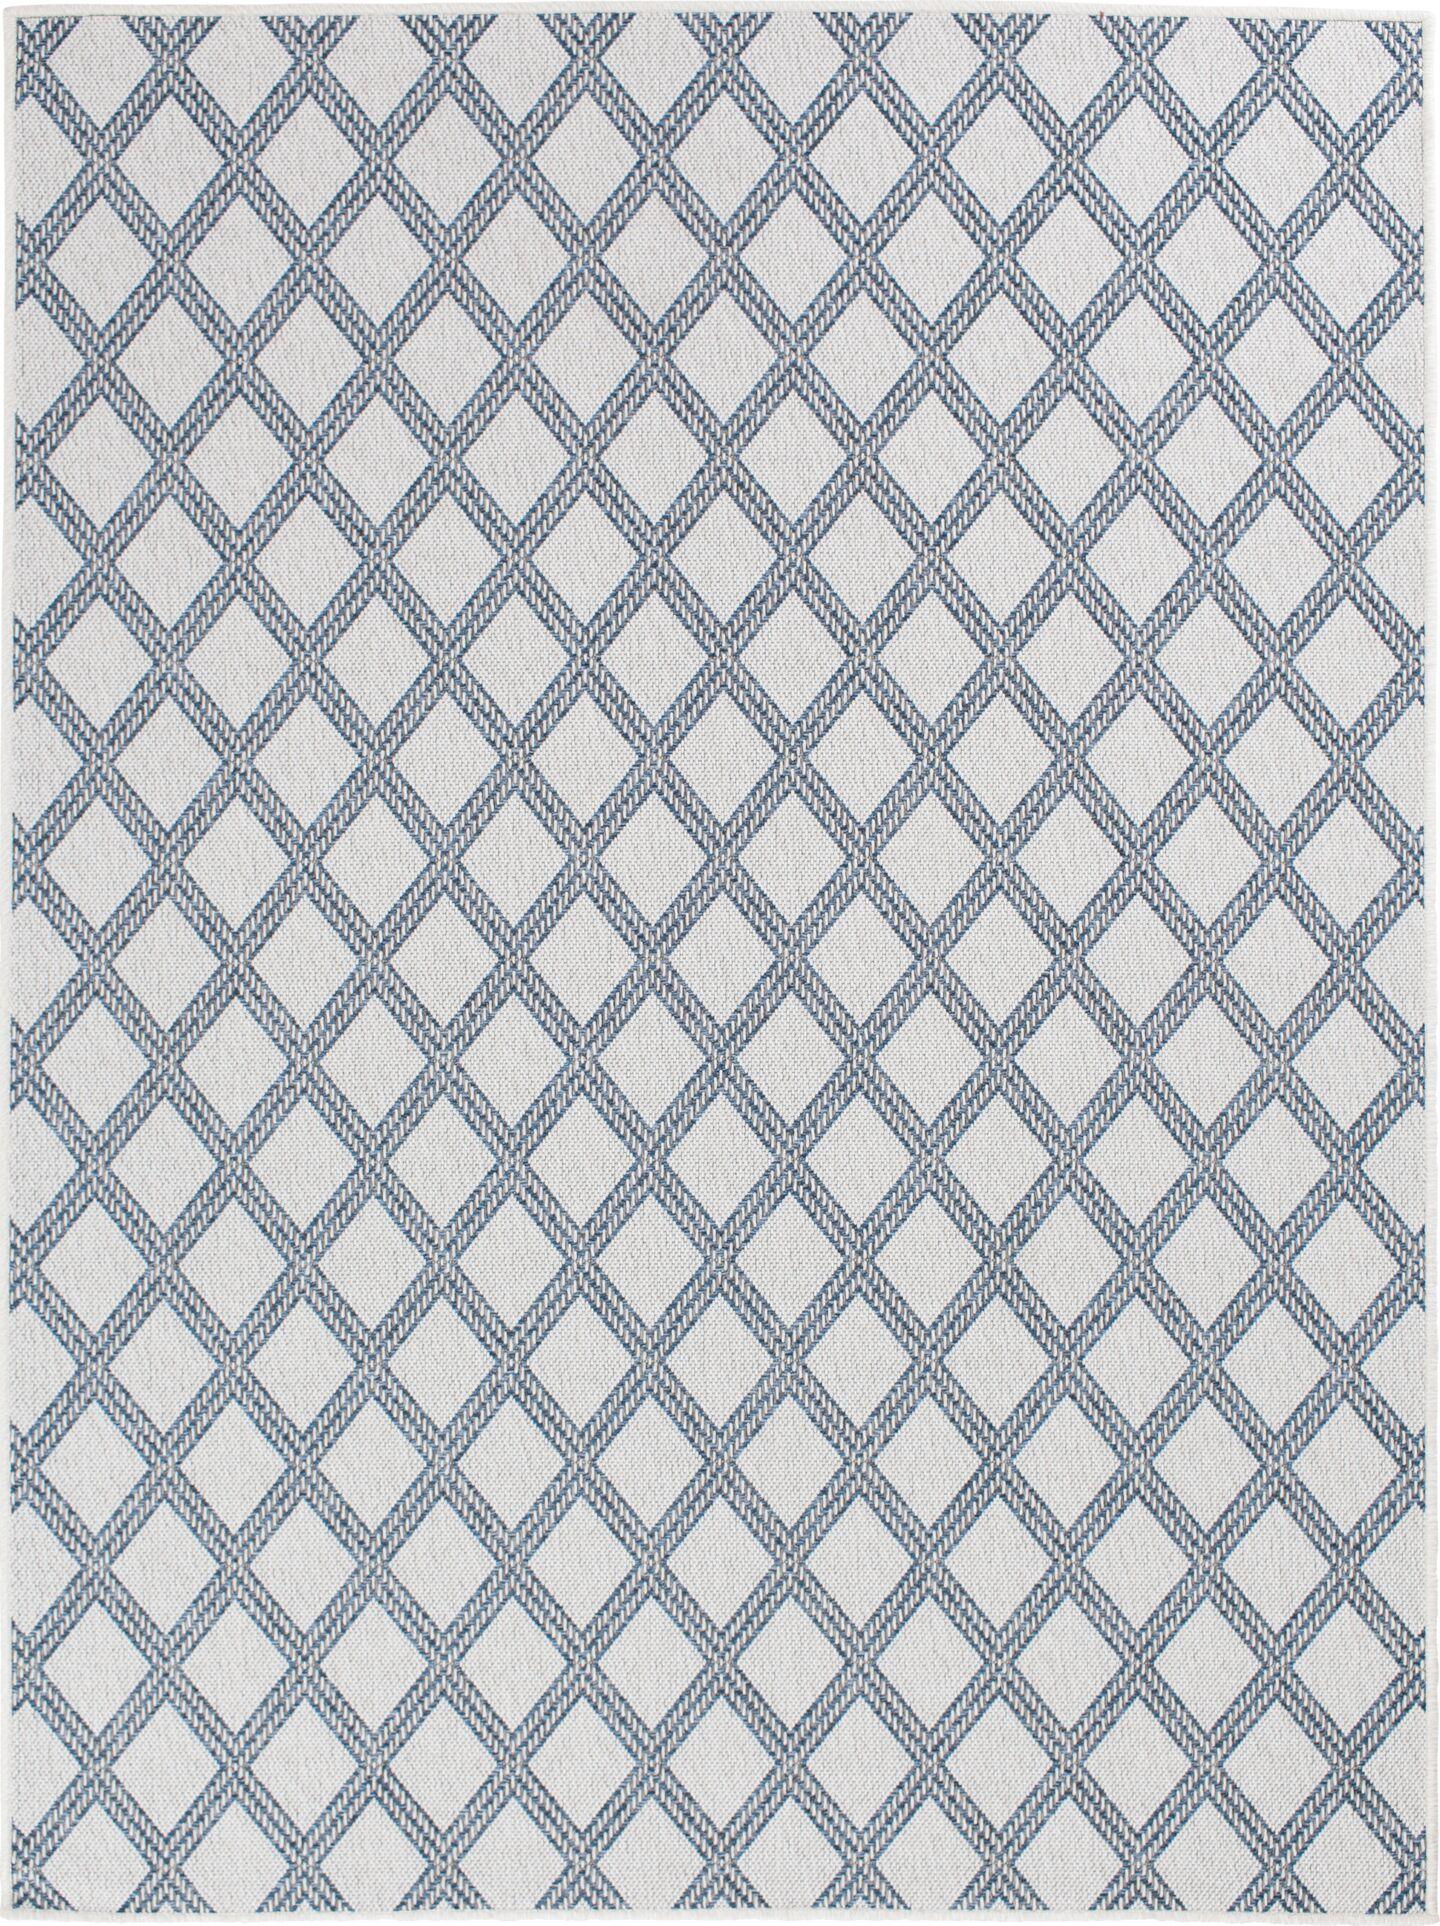 Almeda Diamond Gray Area Rug Rug Size: Rectangle 6'7